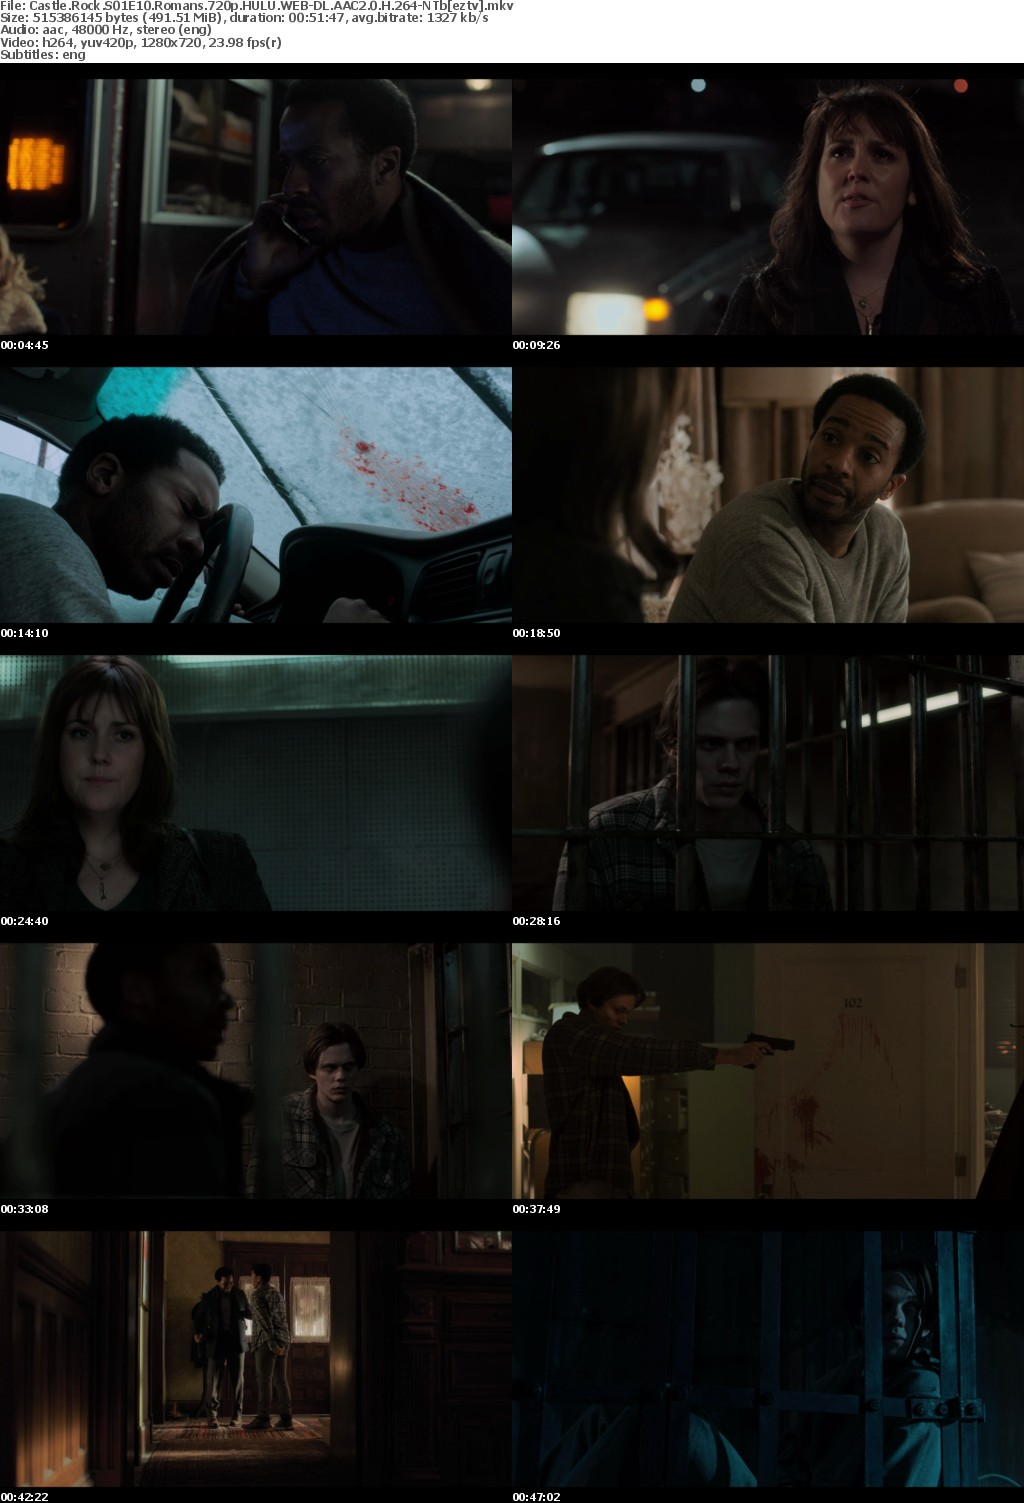 Castle Rock S01E10 Romans 720p HULU WEB-DL AAC2.0 H264-NTb